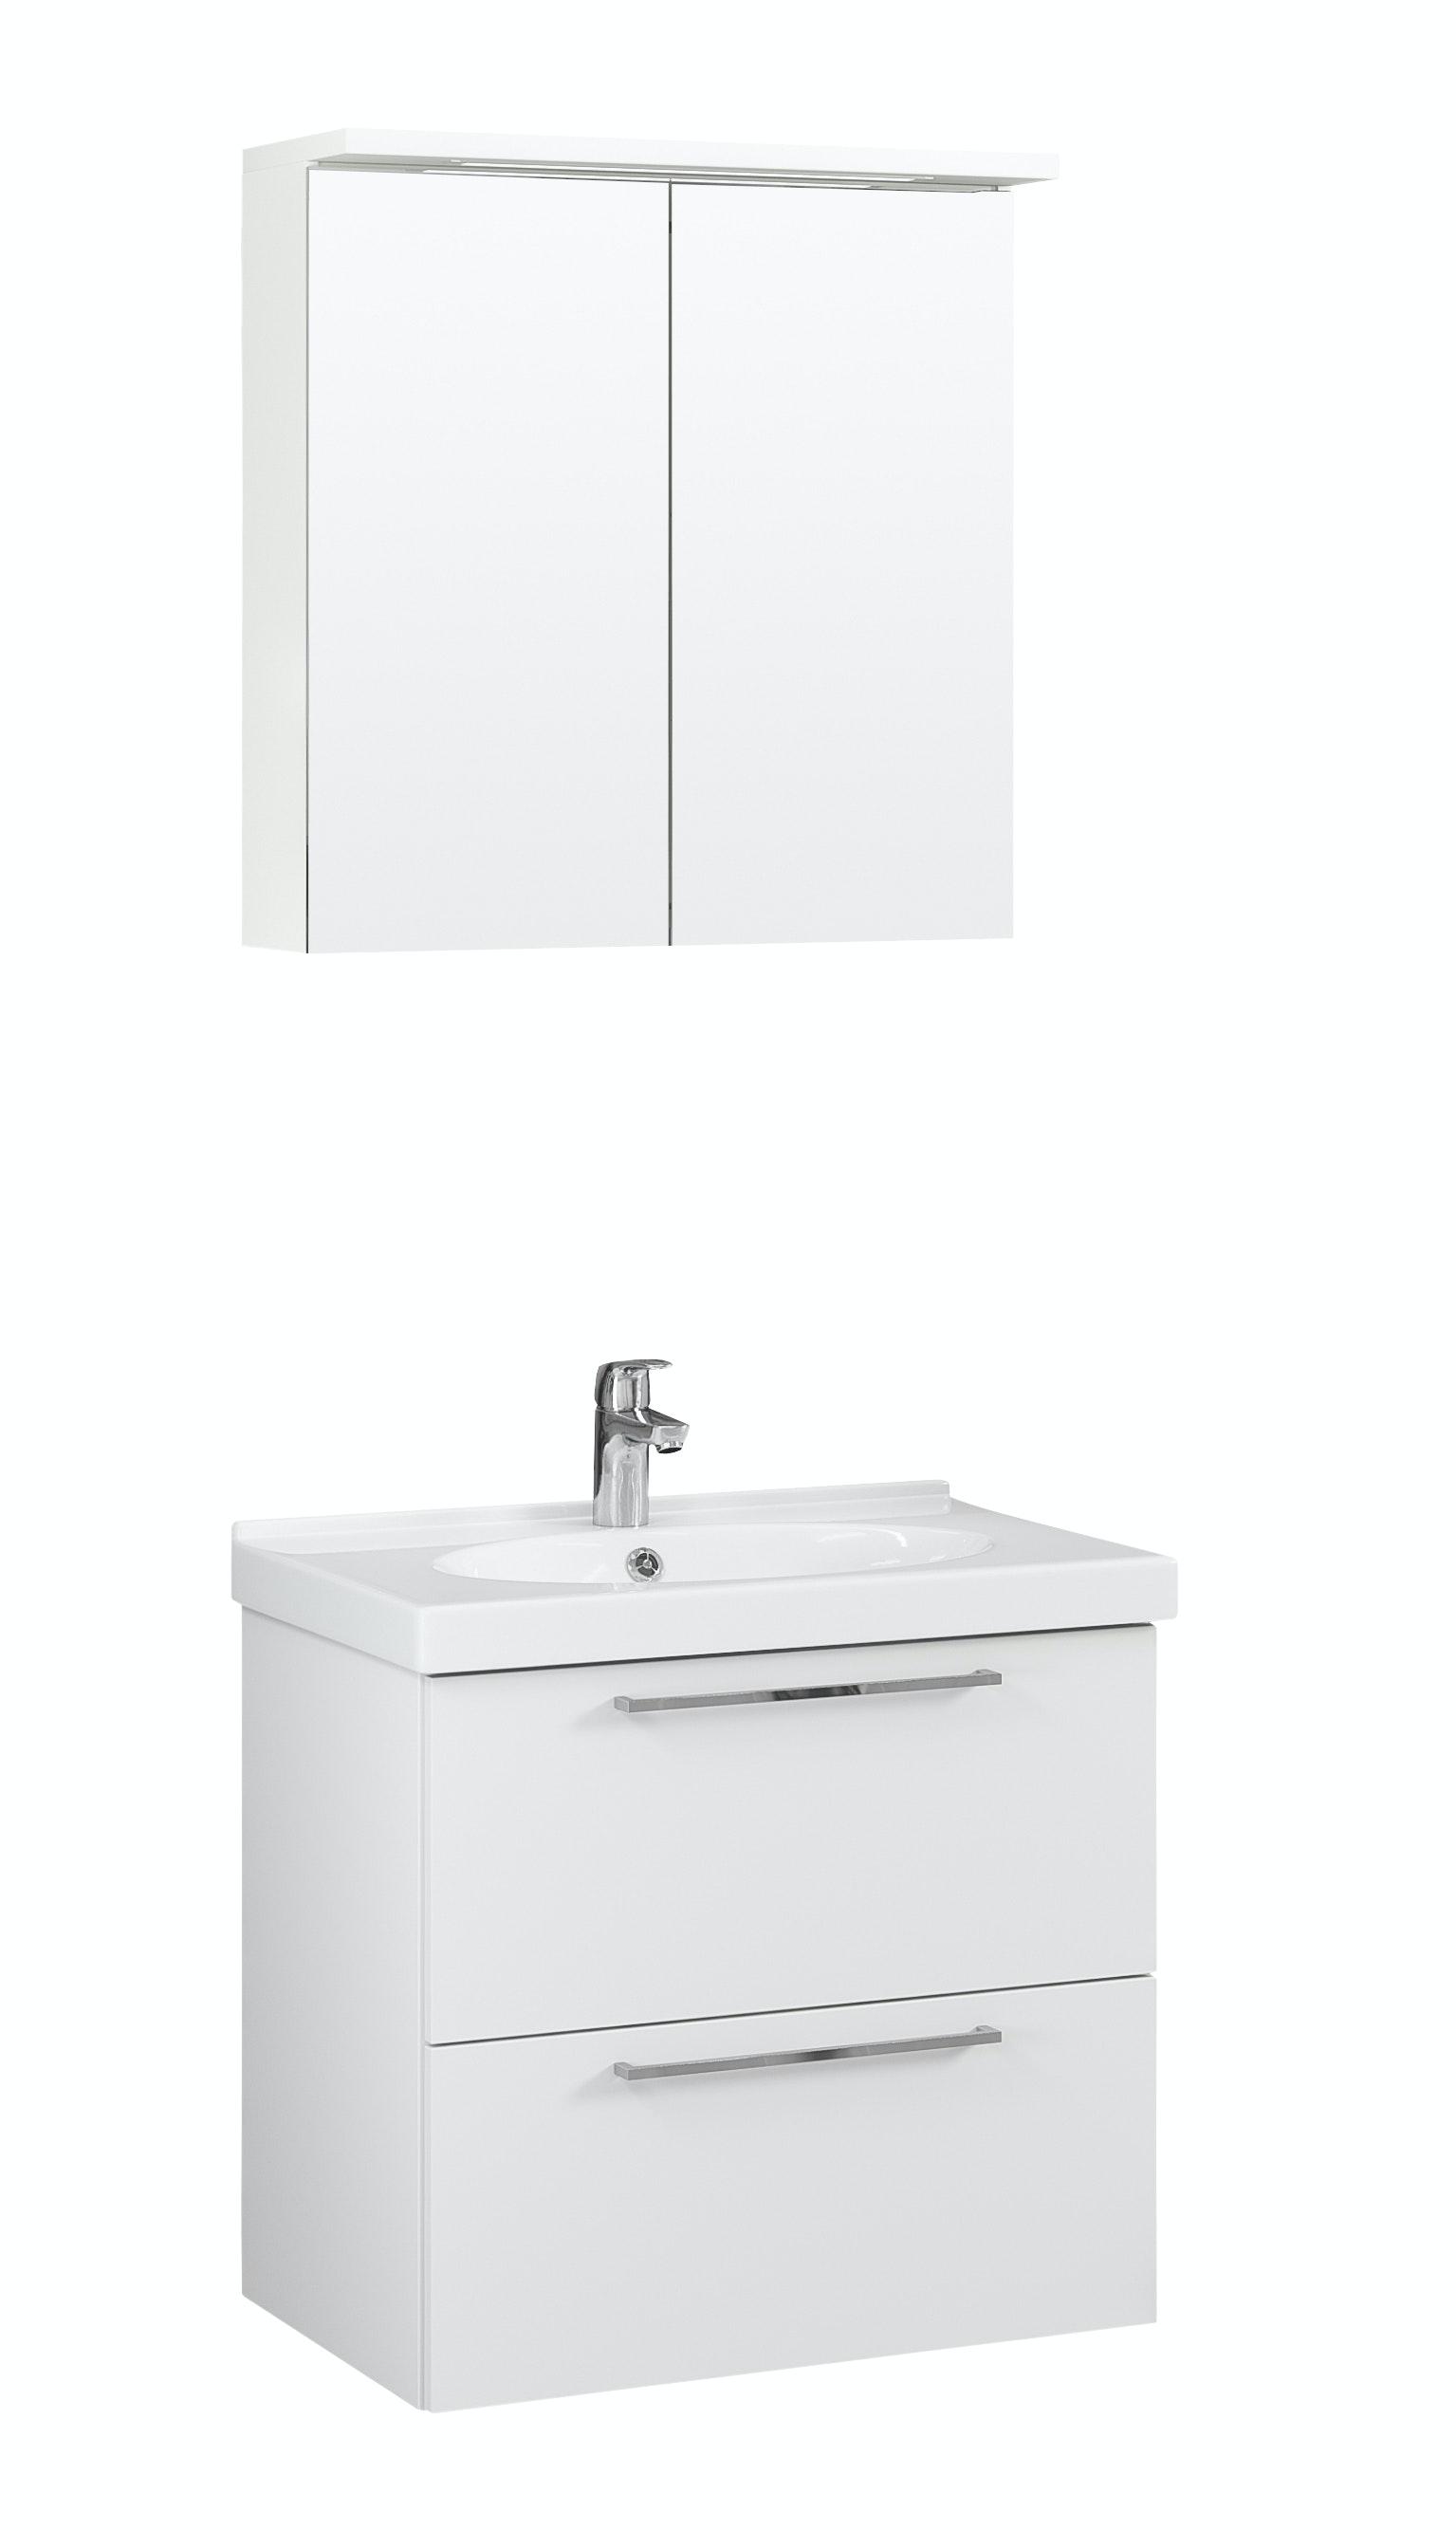 Möbelpaket Temal Trend 67X45 Vit Med Spegelskåp